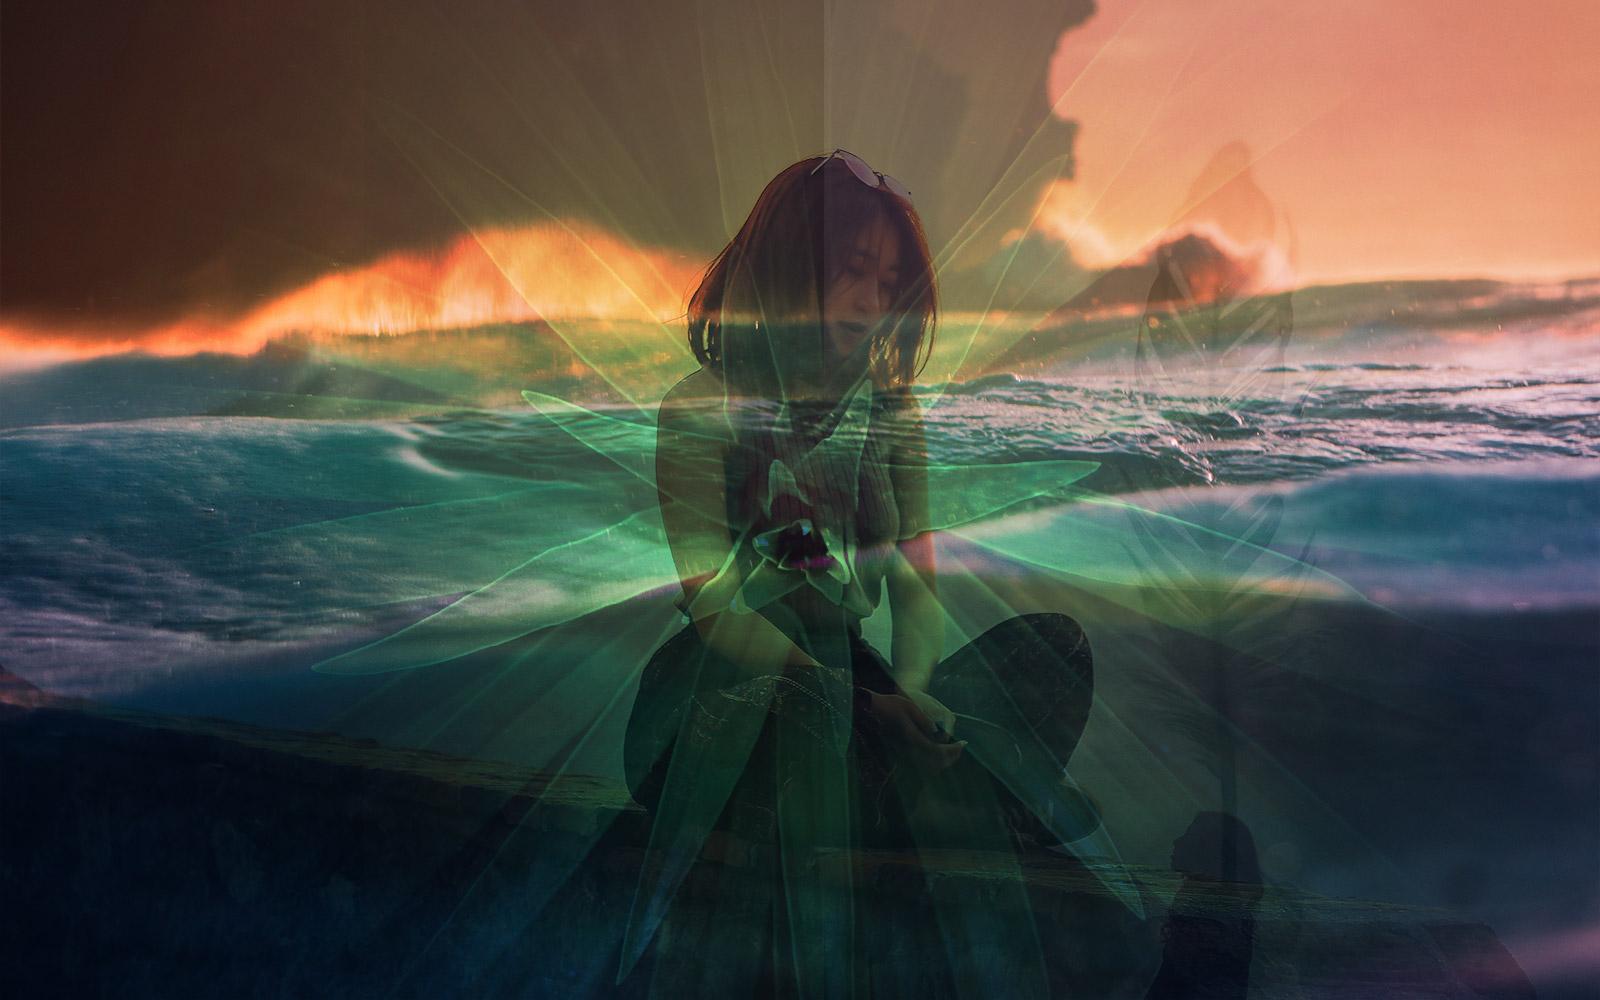 Open to New Pathways of Healing